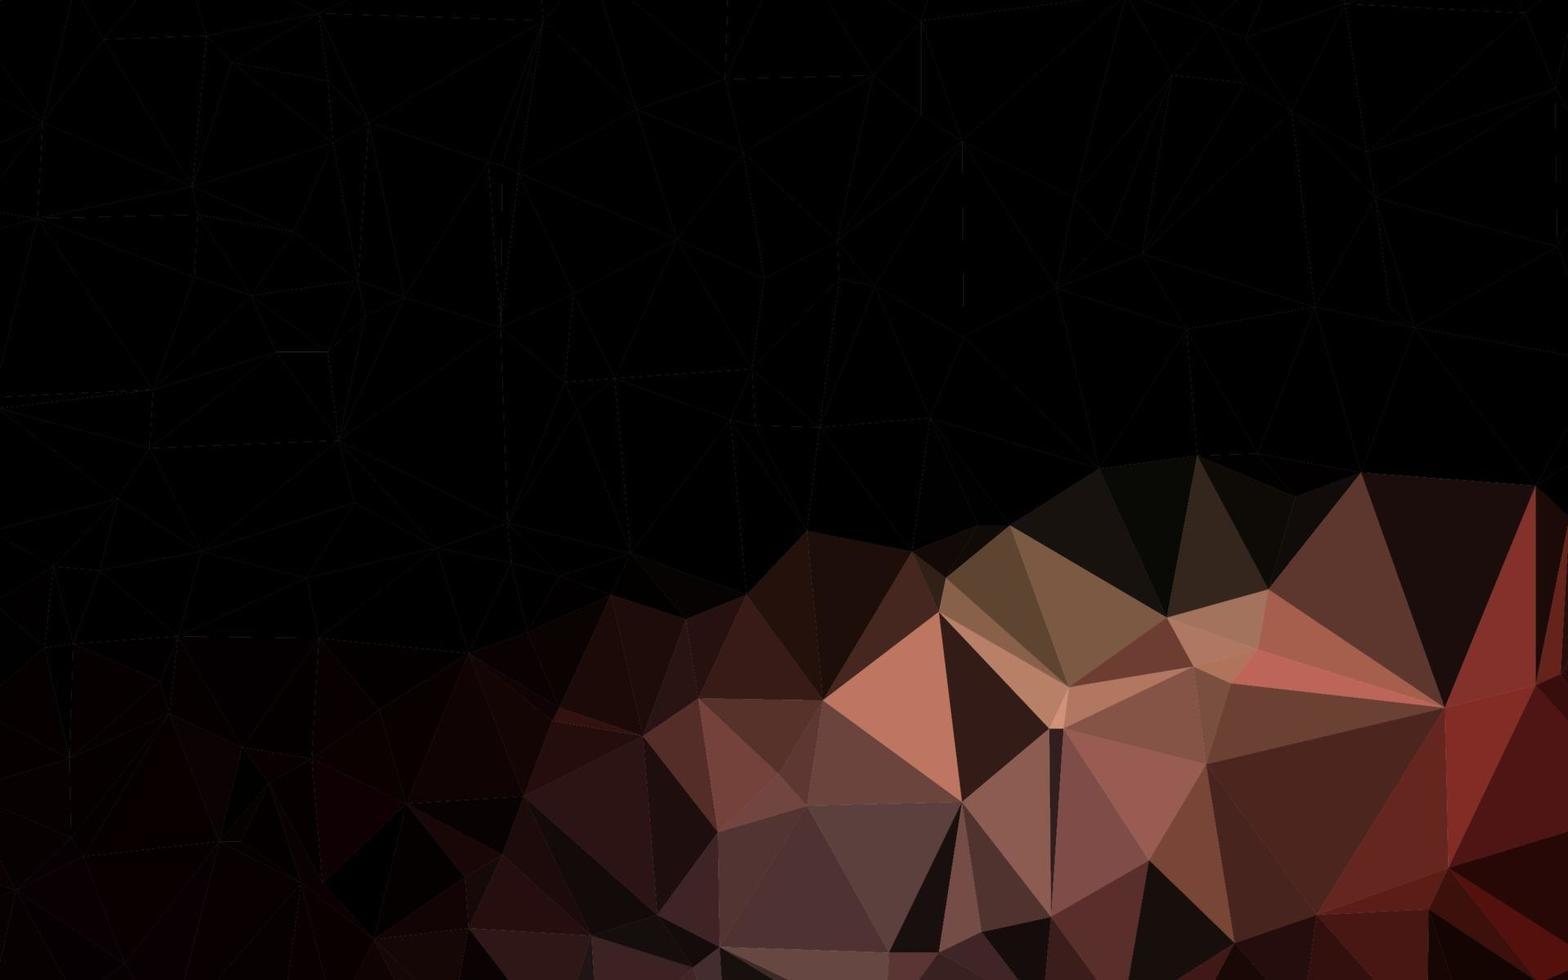 fundo abstrato do vetor polígono vermelho escuro.